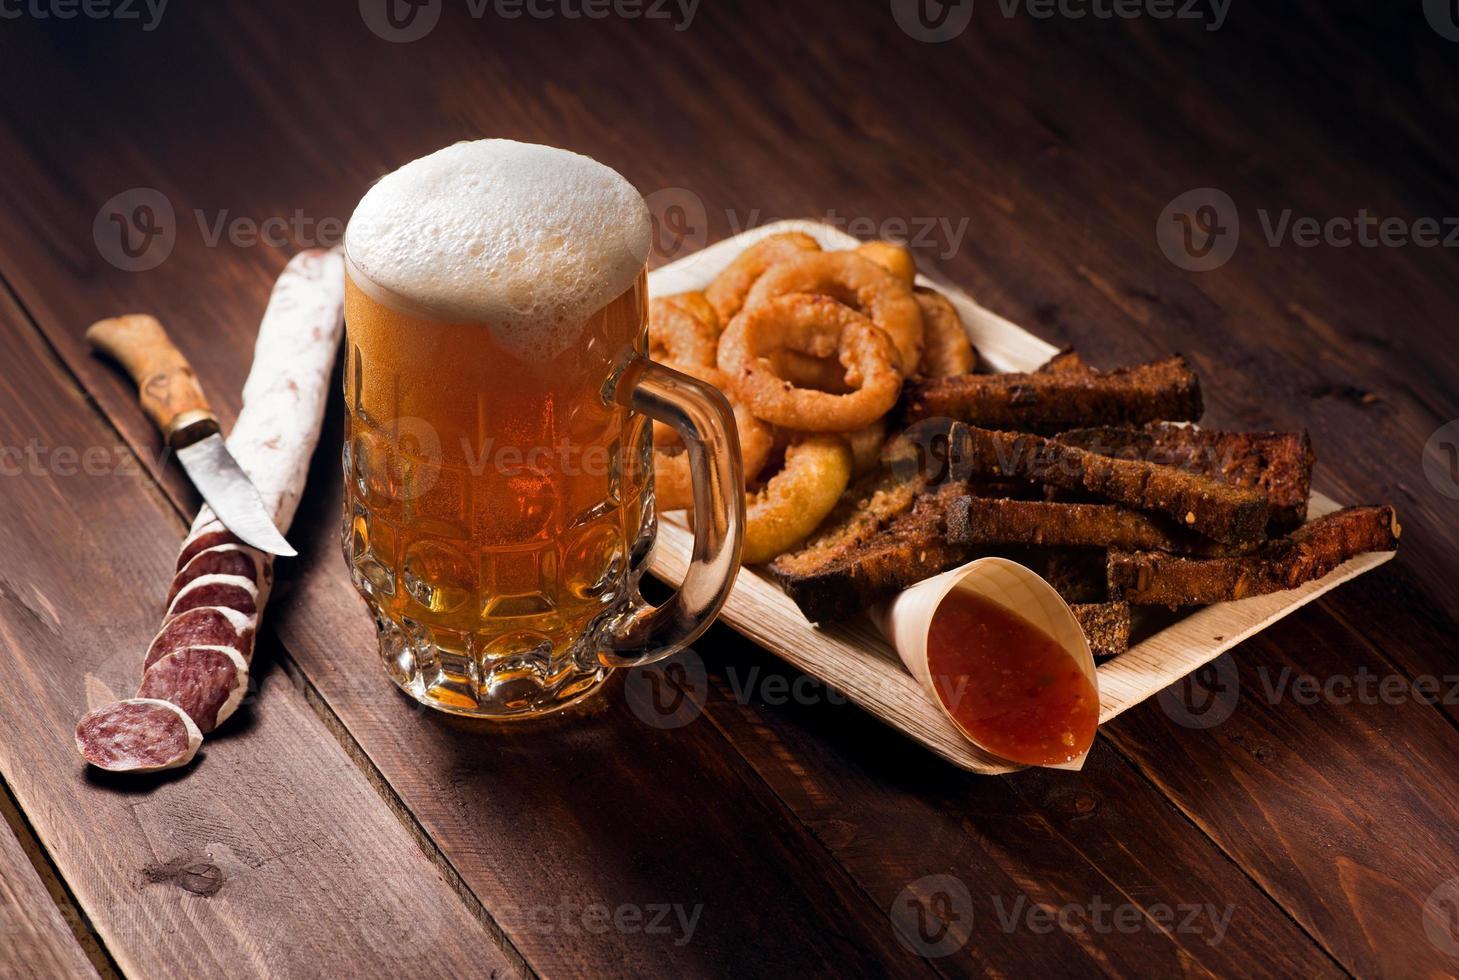 Krug Bier mit Snacks foto